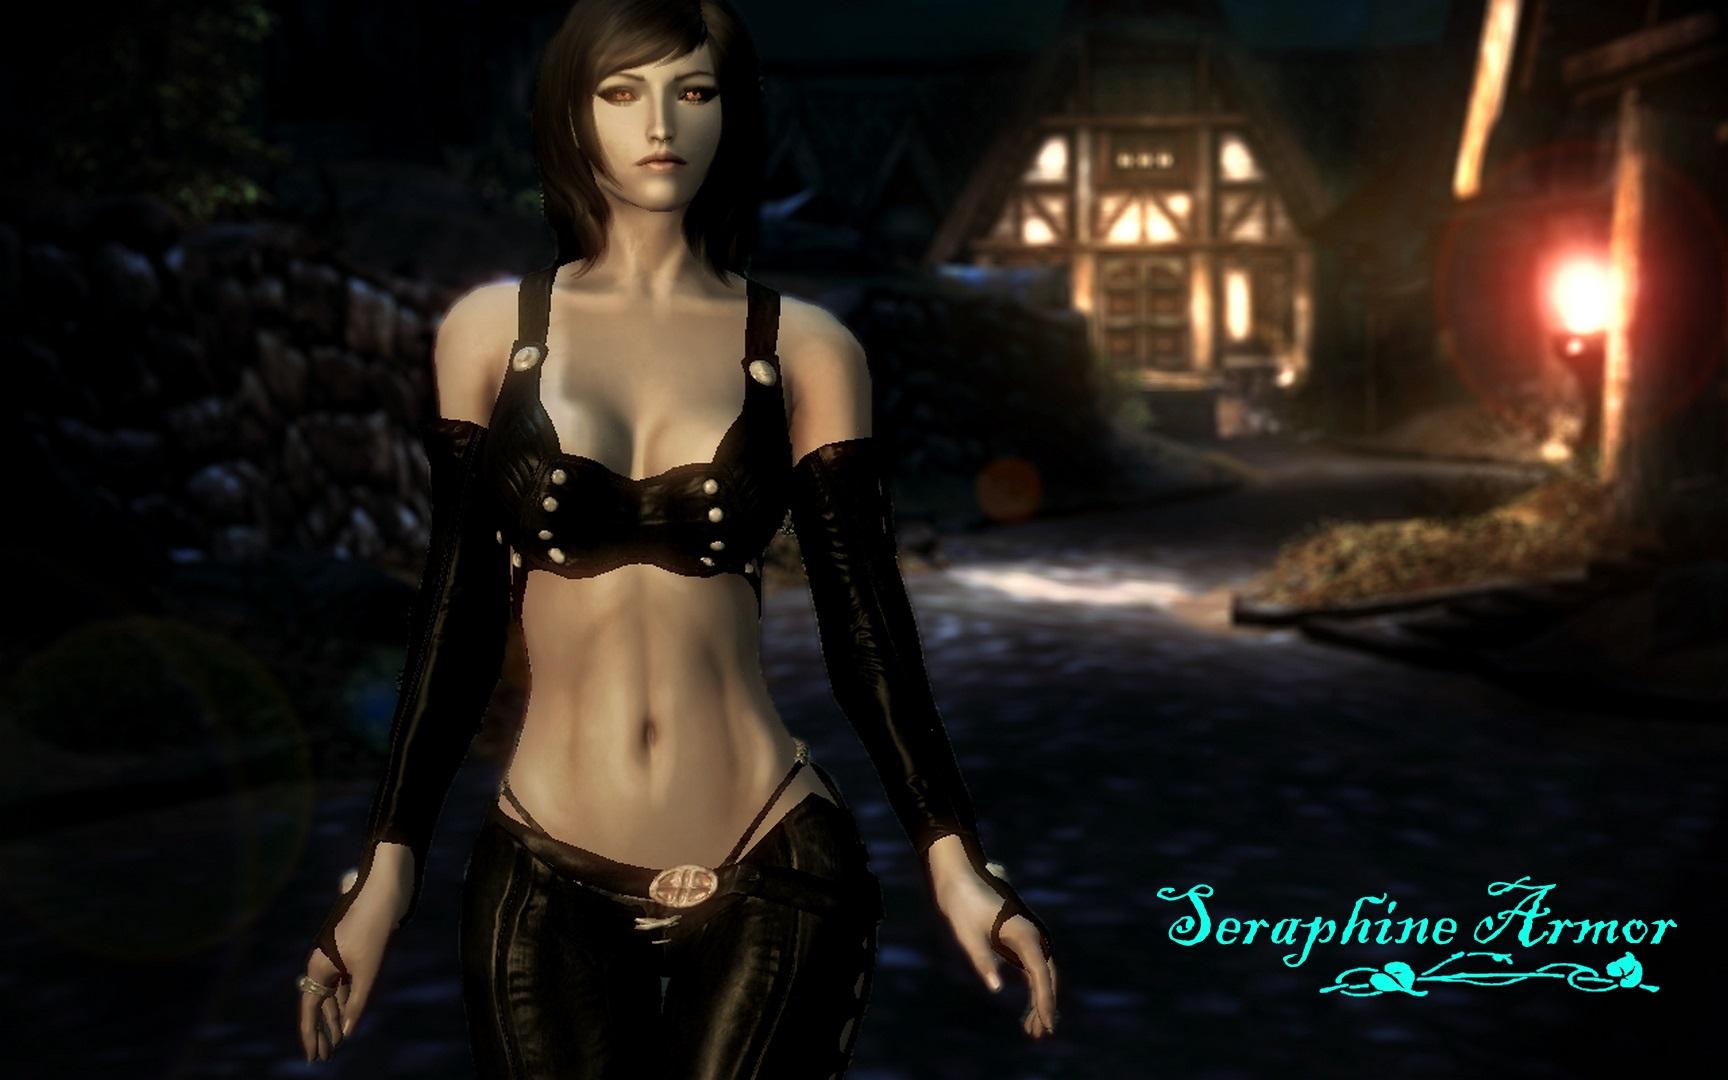 Seraphine_Armor.jpg